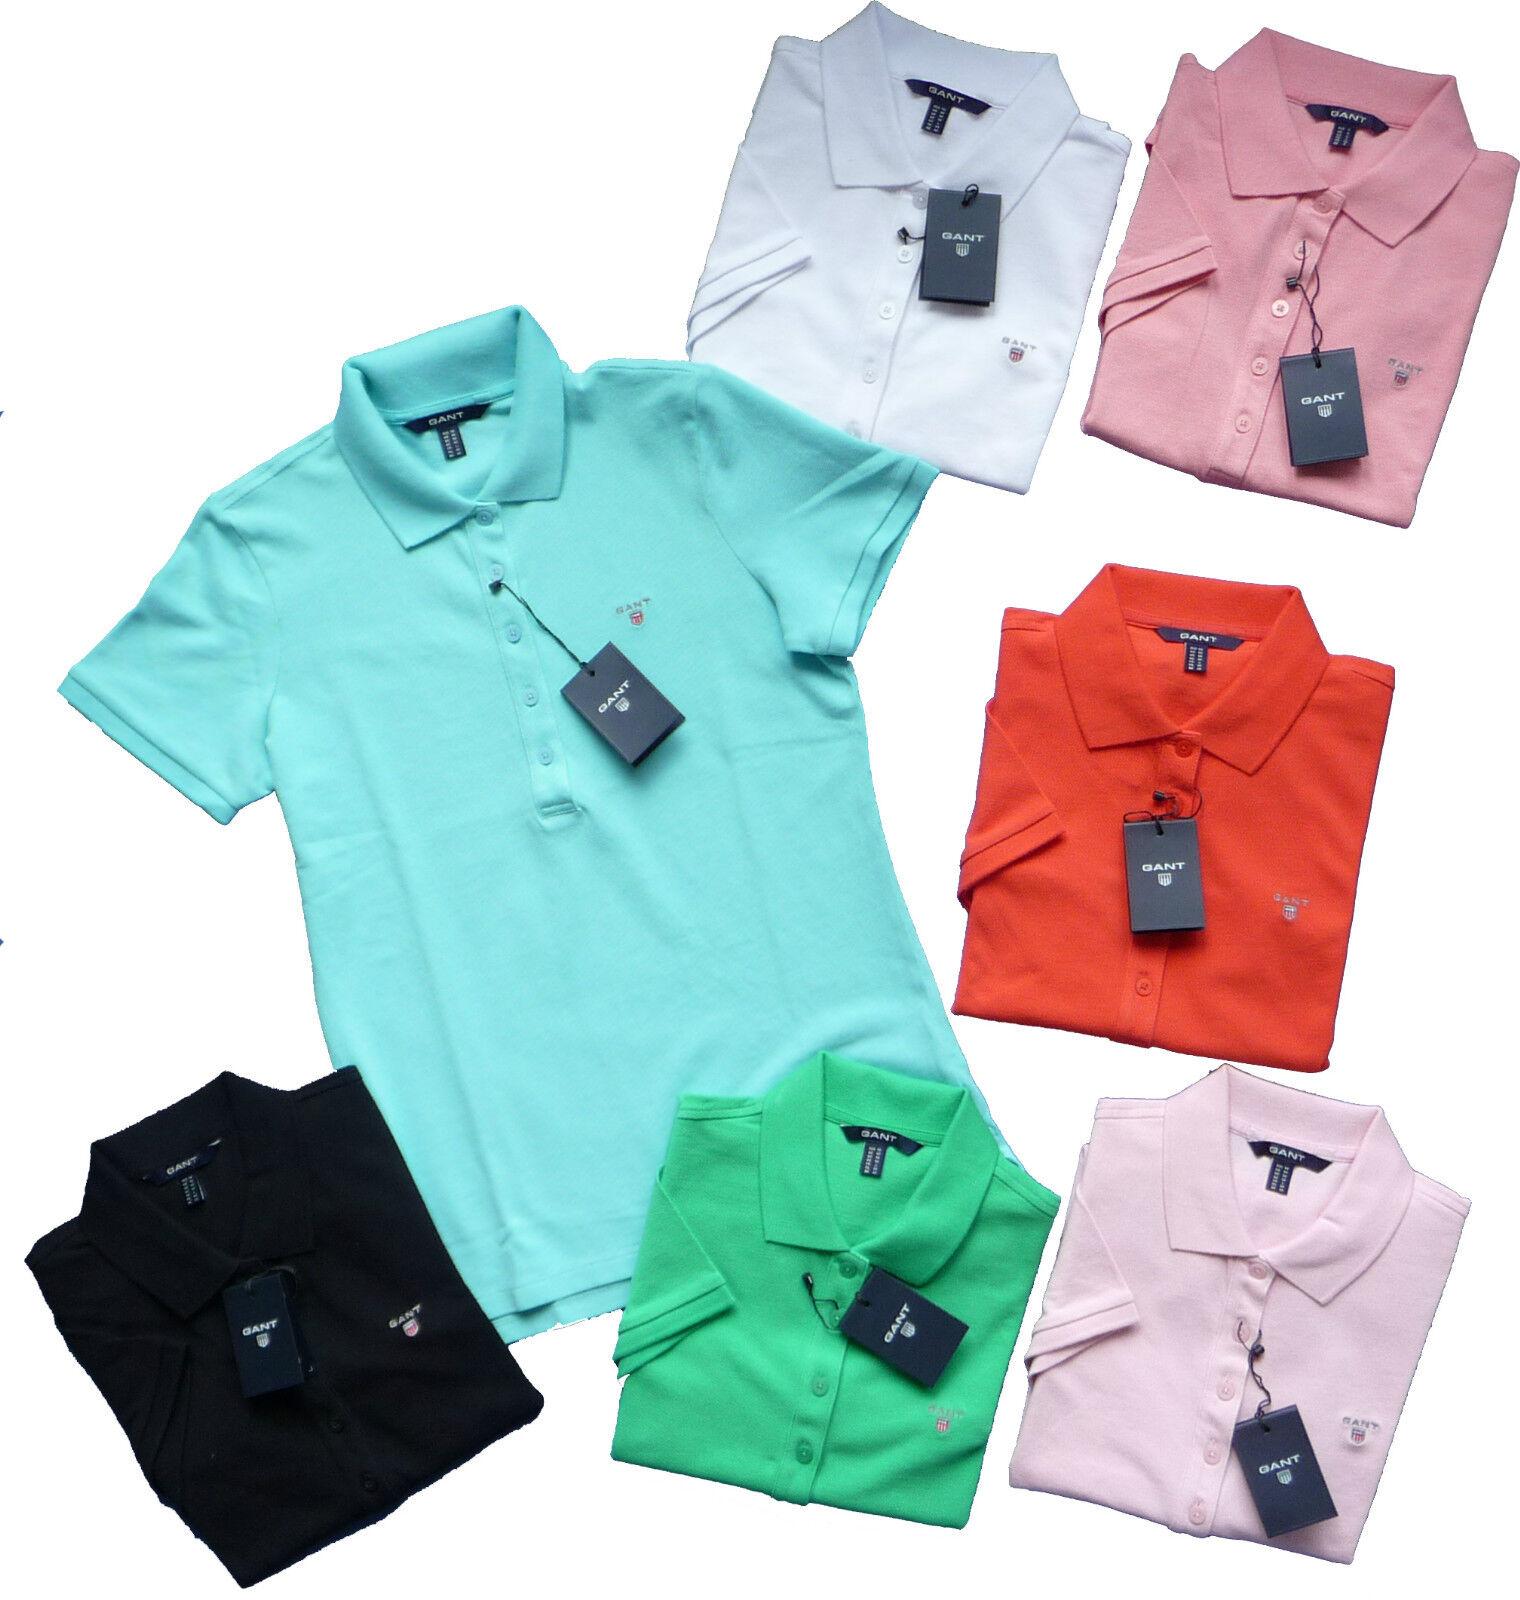 new styles 859ec dccd4 Classic Hemd, Gant Pique, Polo NEU - Größen & Farben viele ...